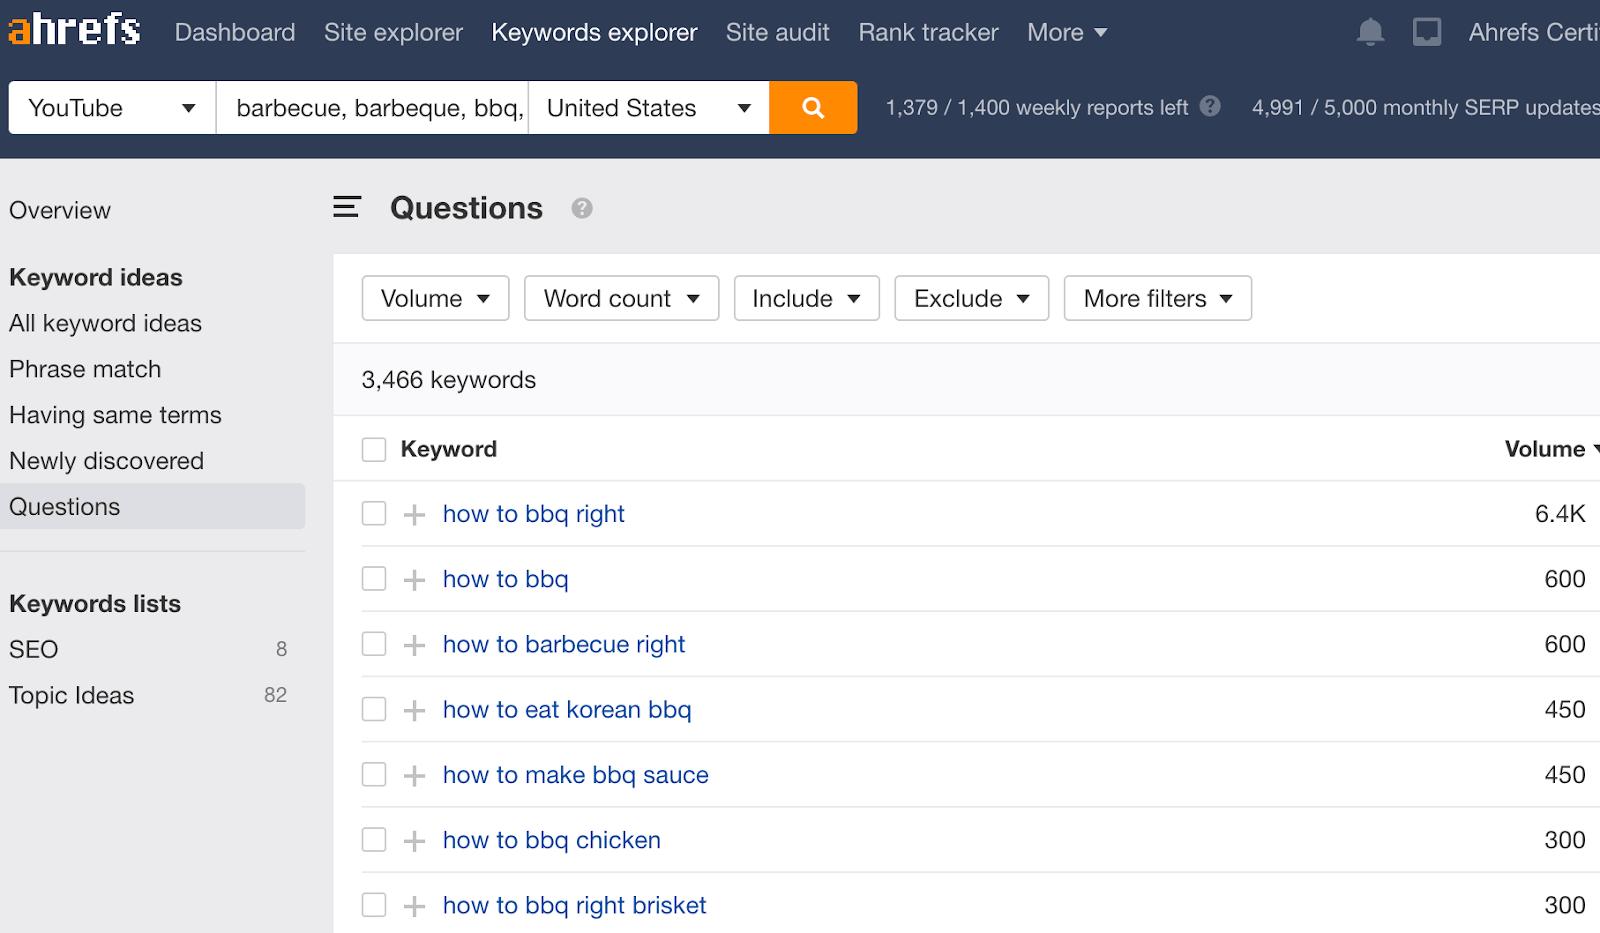 Keywords Explorer